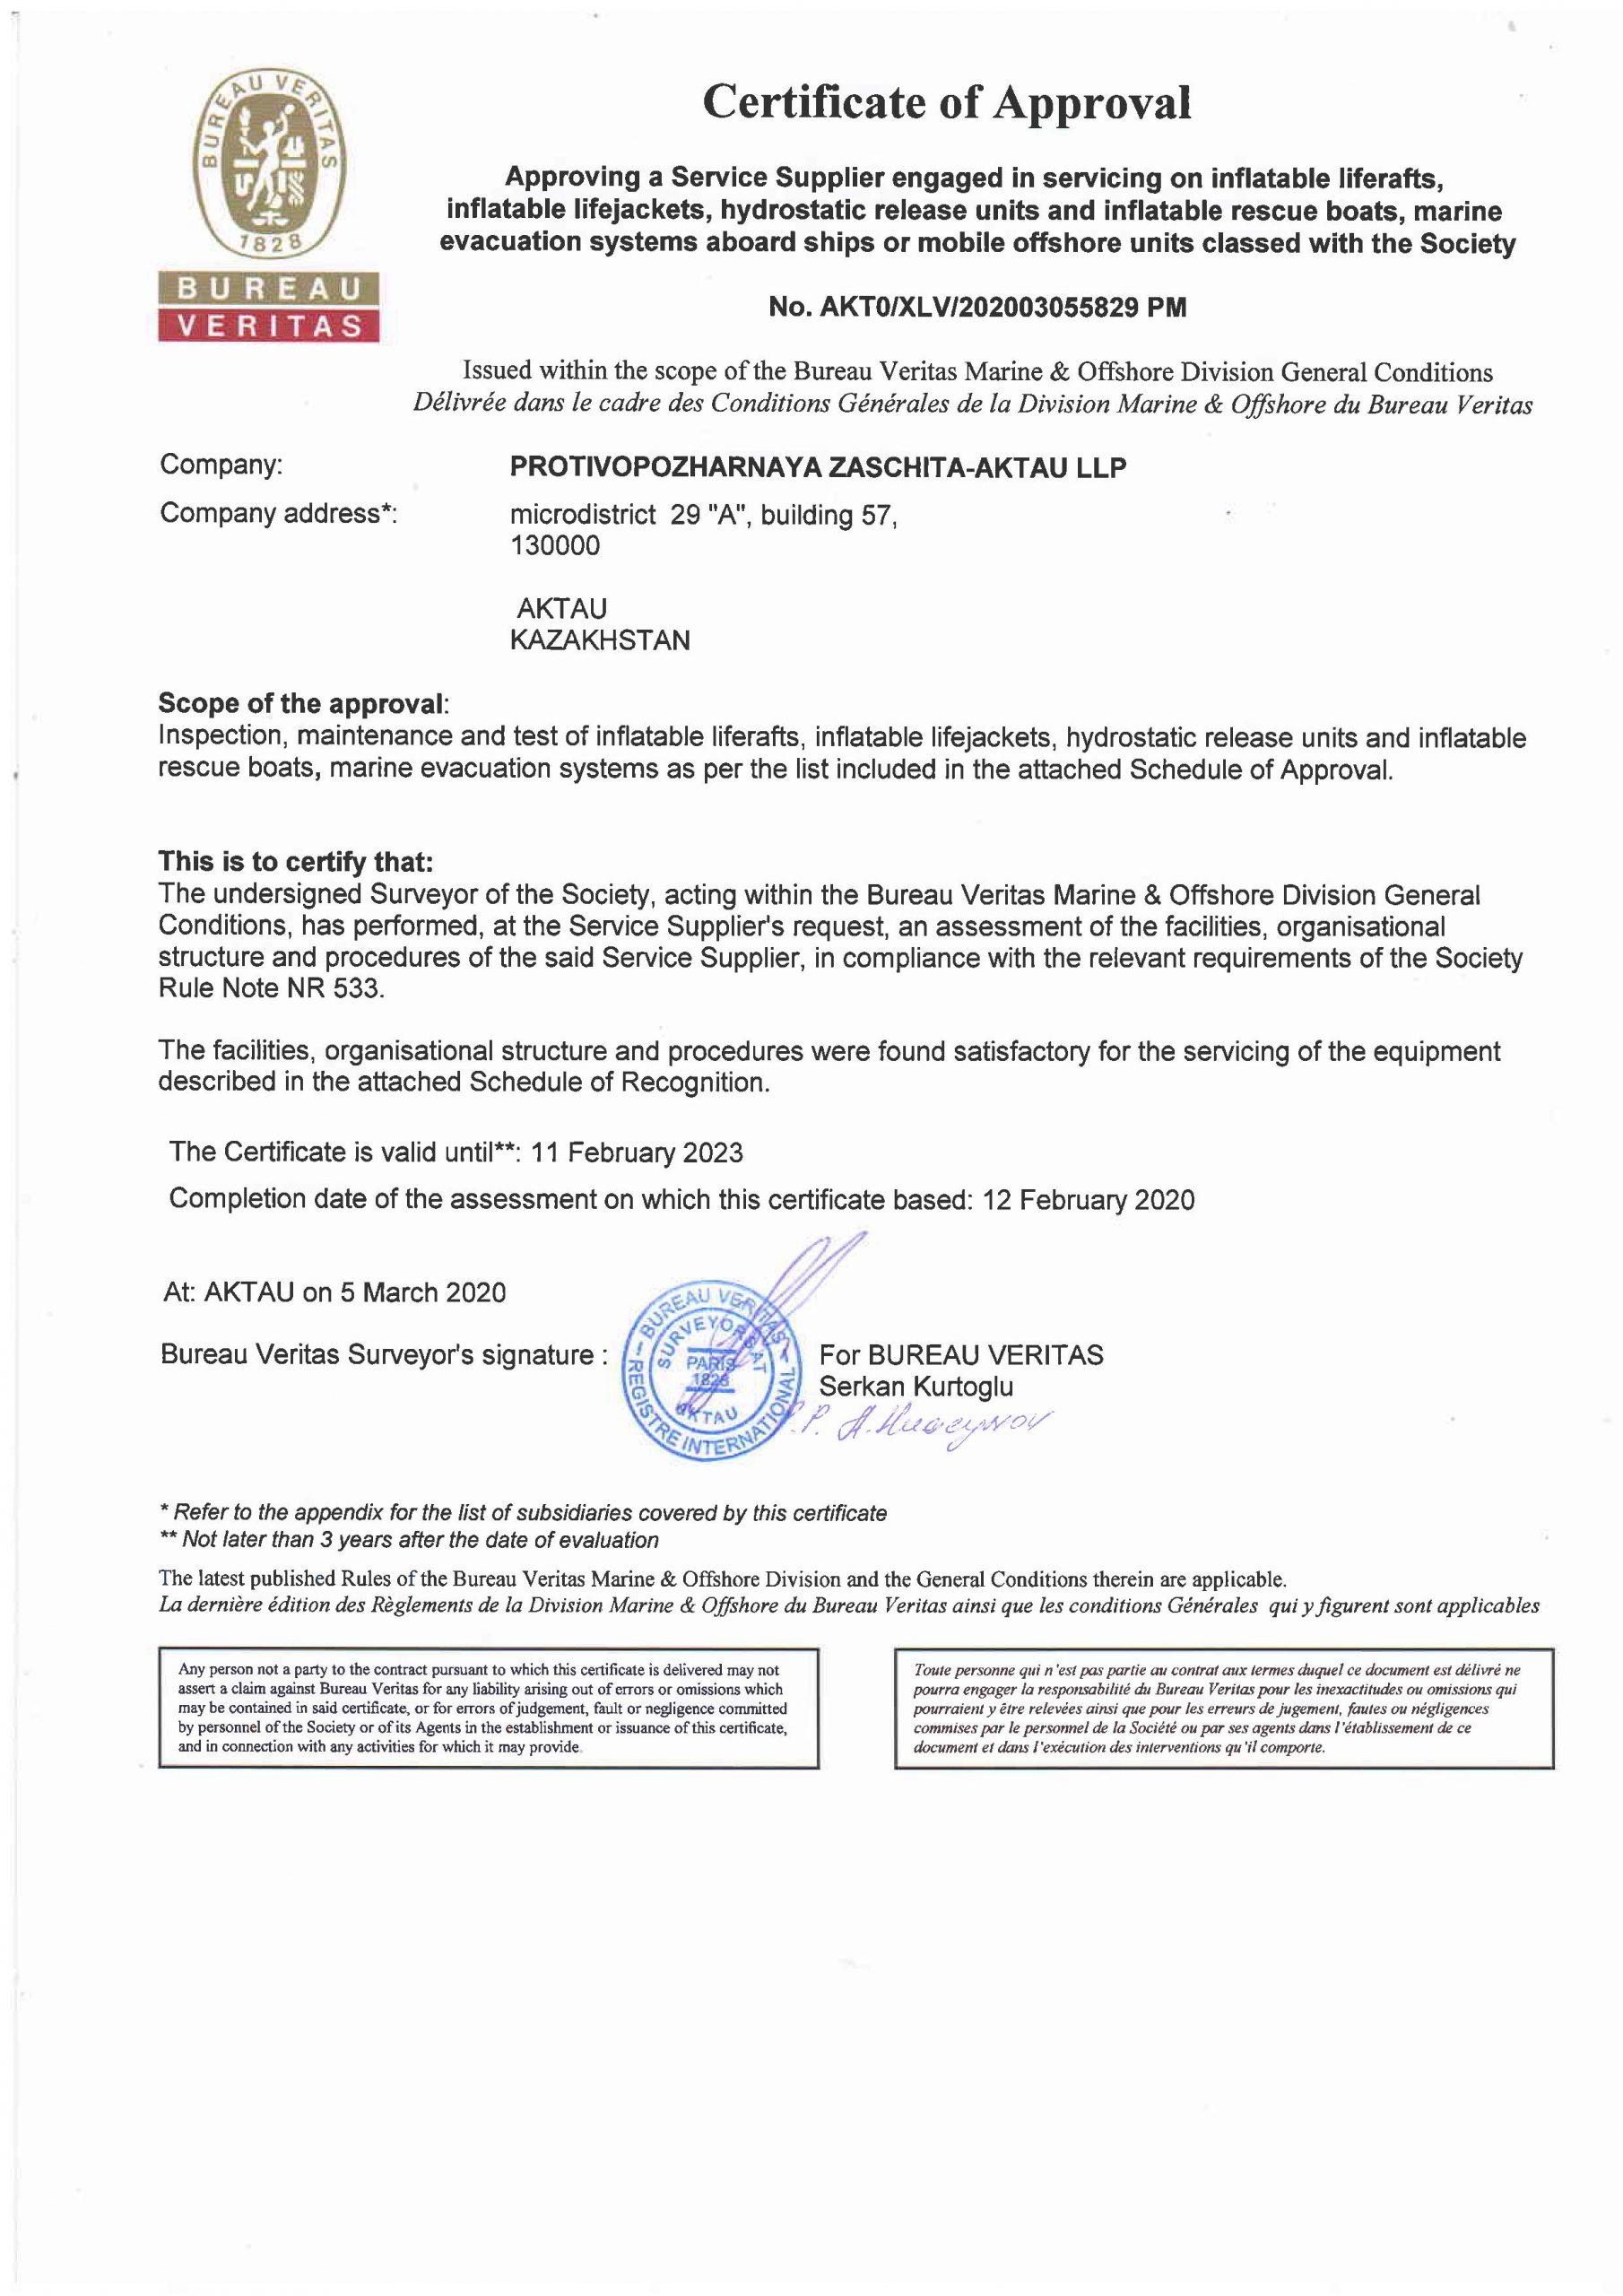 BV — Certificate Approval